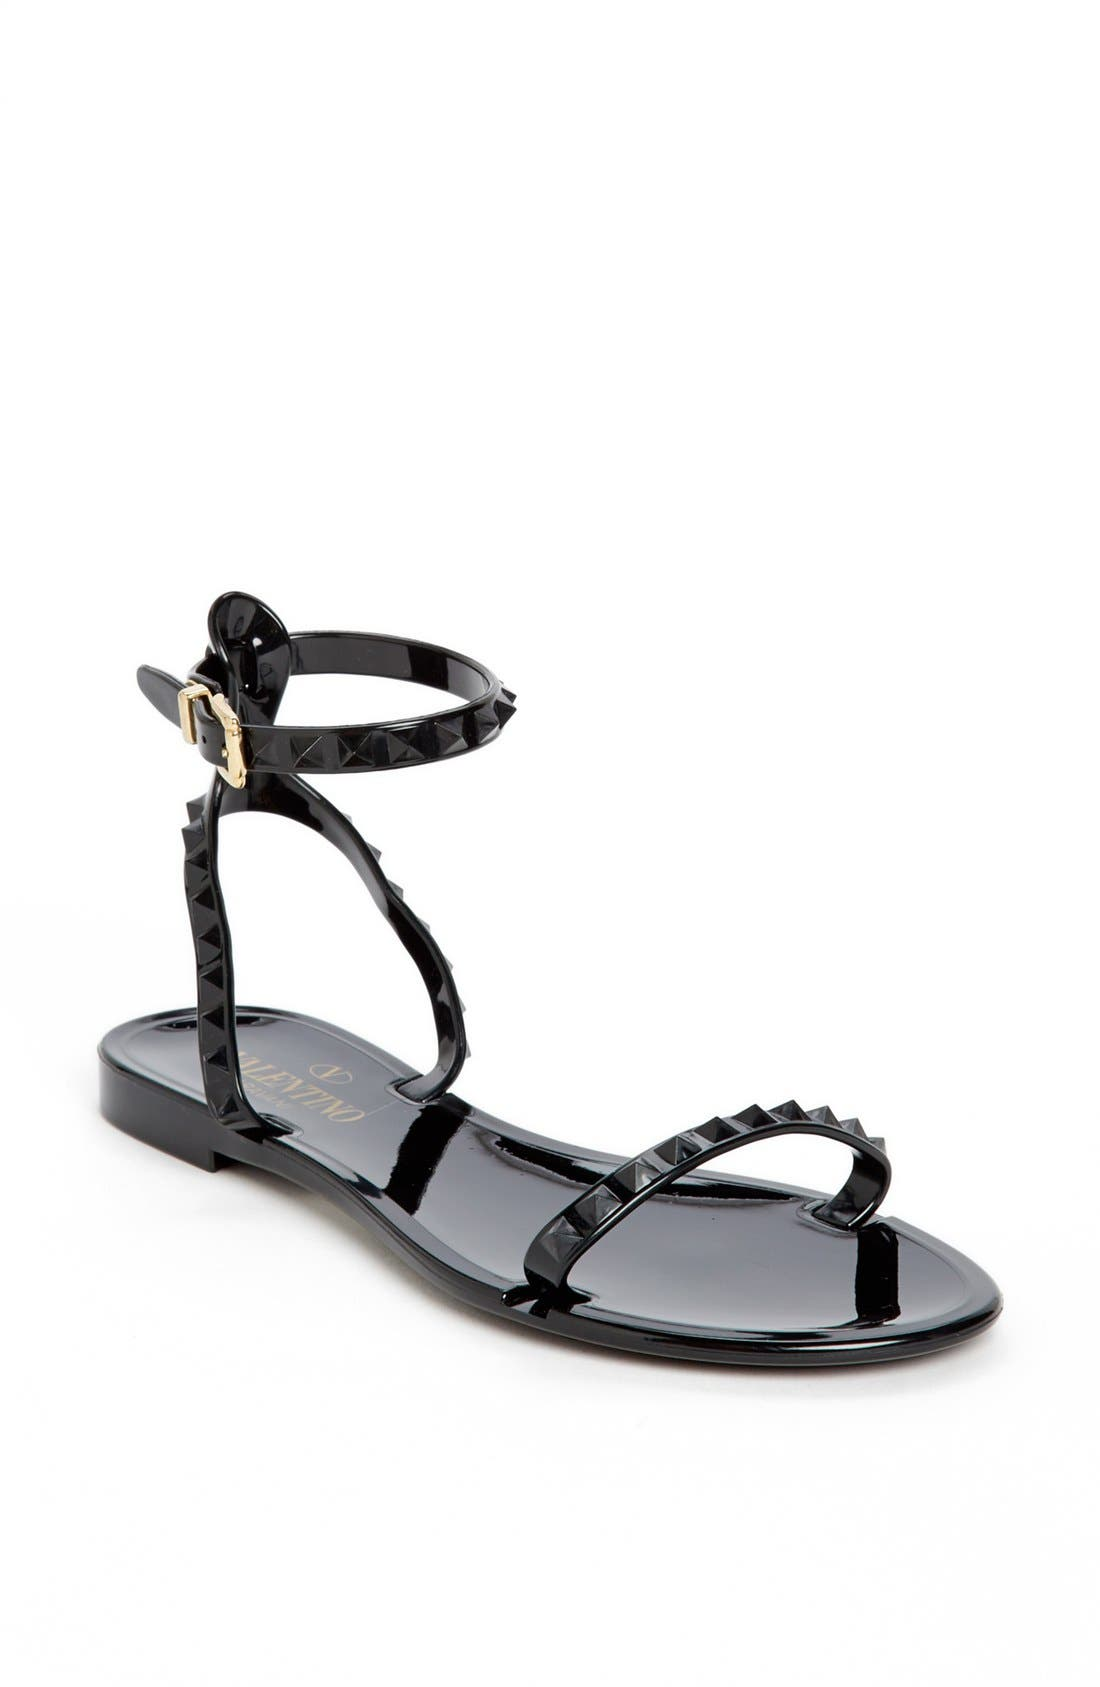 Main Image - Valentino 'Rockstud' Ankle Strap Sandal